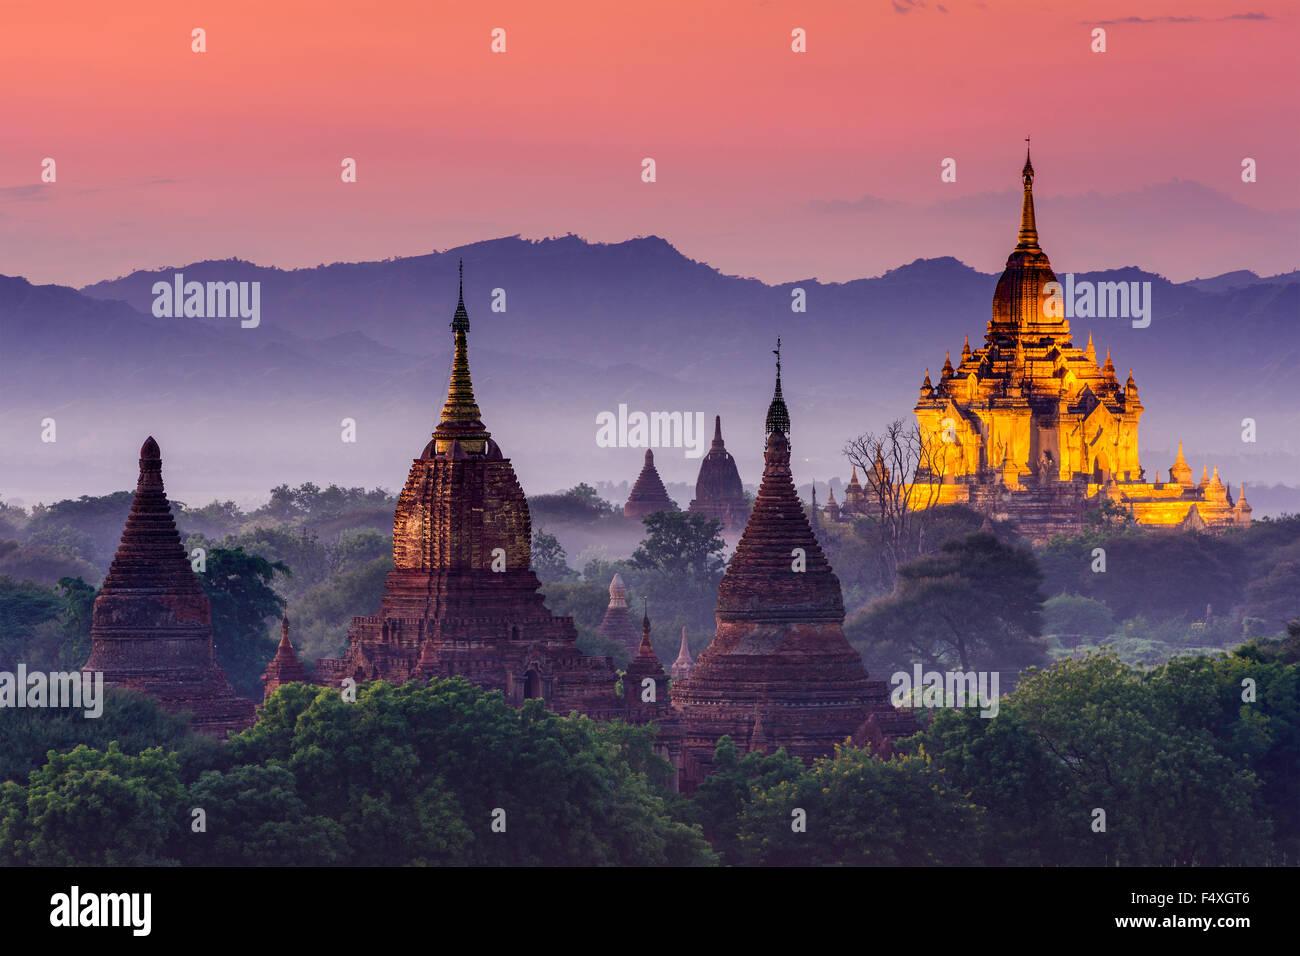 Bagan, Myanmar ancient temples at dusk. Stock Photo